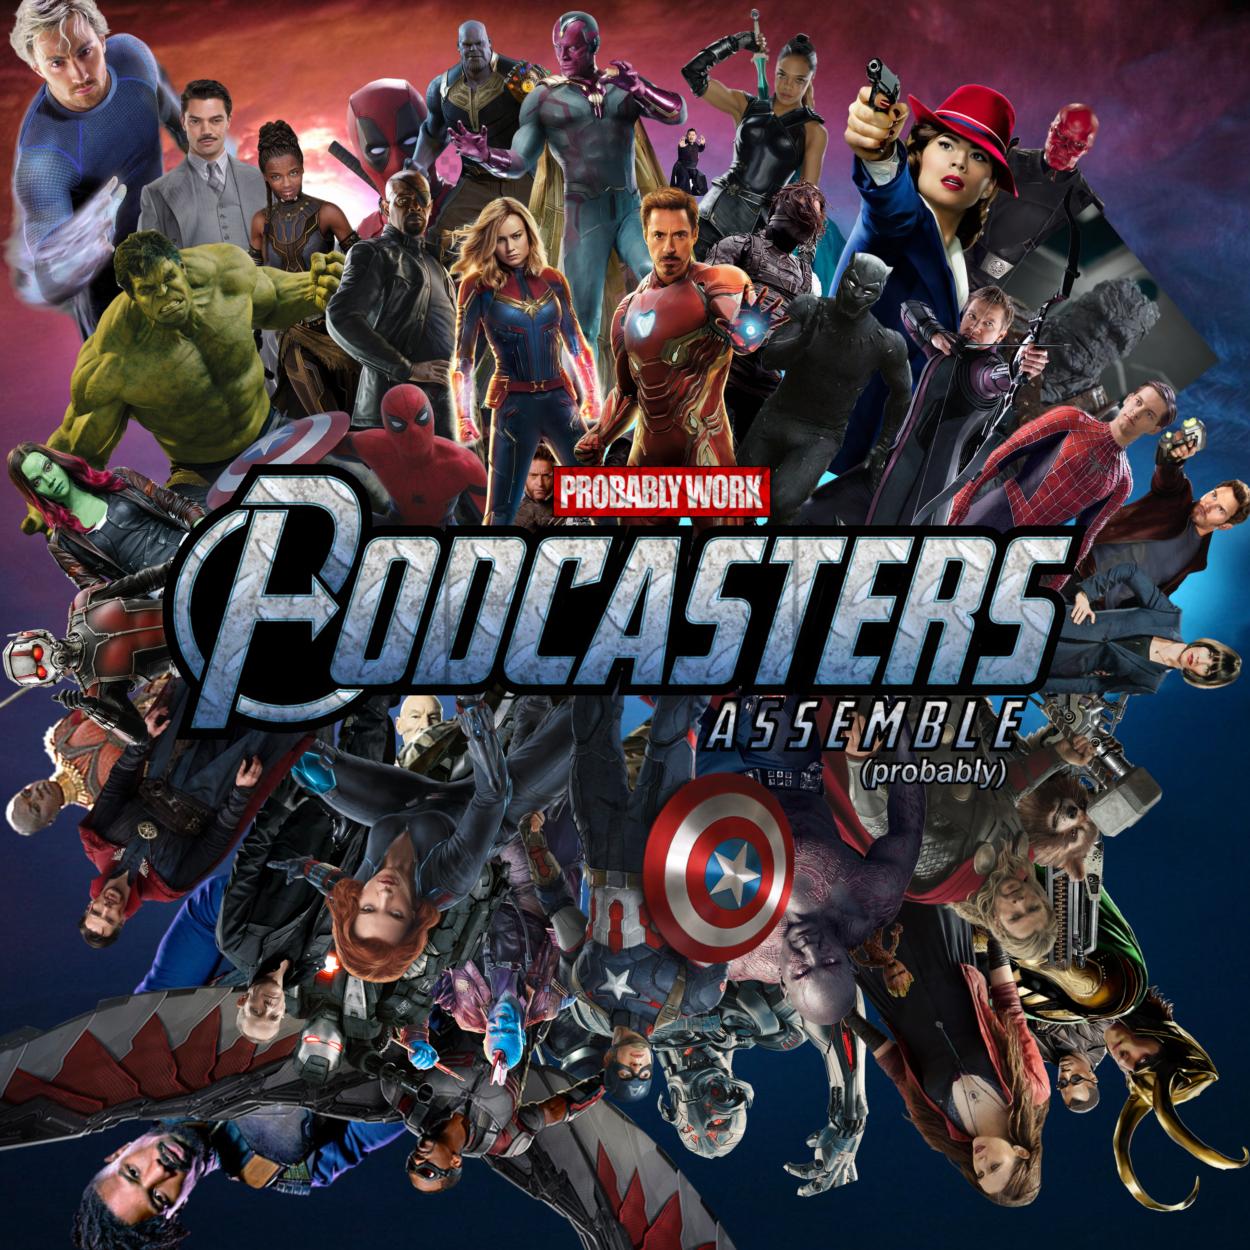 Mcu Episode 23 Avengers Endgame 2019 Podcasters Assemble